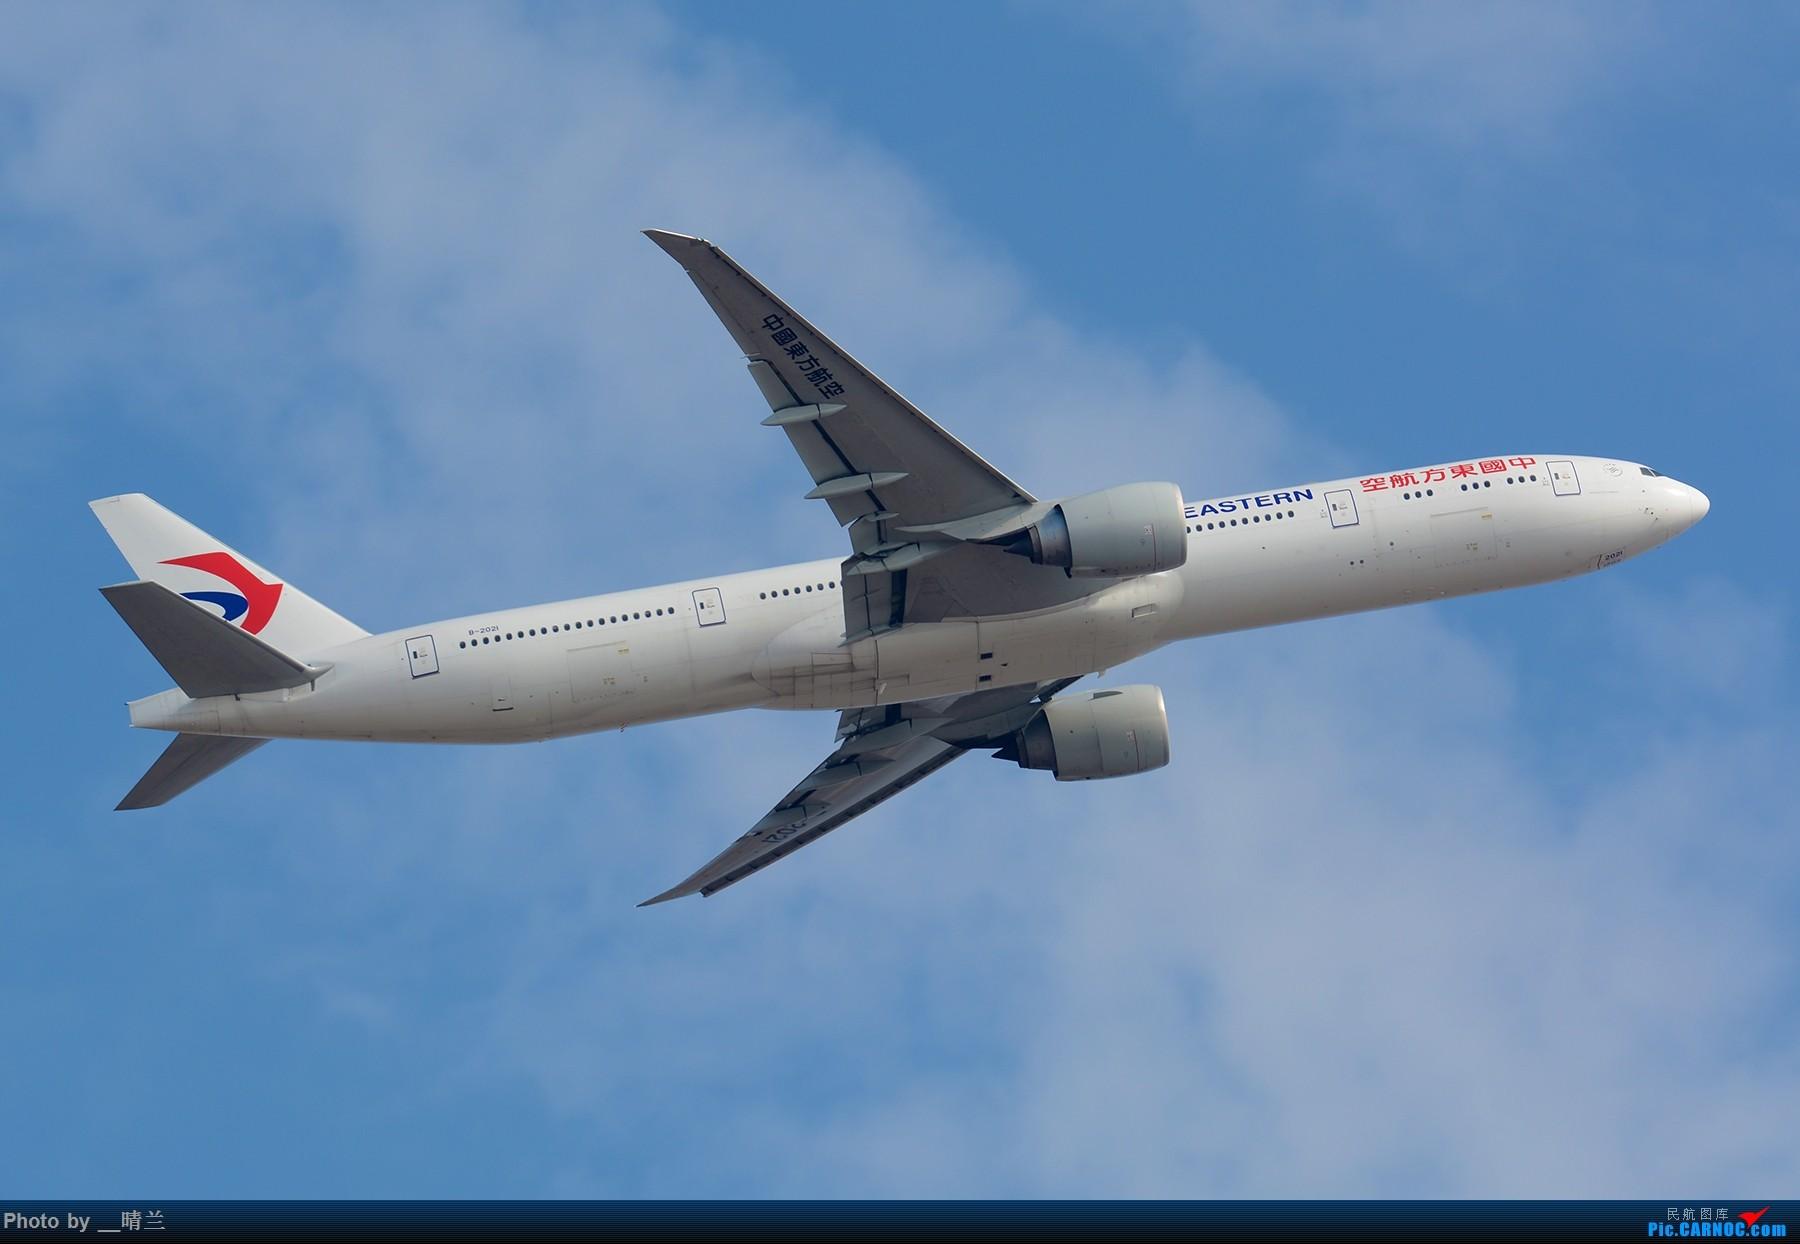 Re:[原创]【PVG】大年初二 新角度解锁 集齐7只77W 召唤748一枚!#祝各位飞友新的一年一飞冲天!# BOEING 777-300ER B-2021 中国上海浦东国际机场